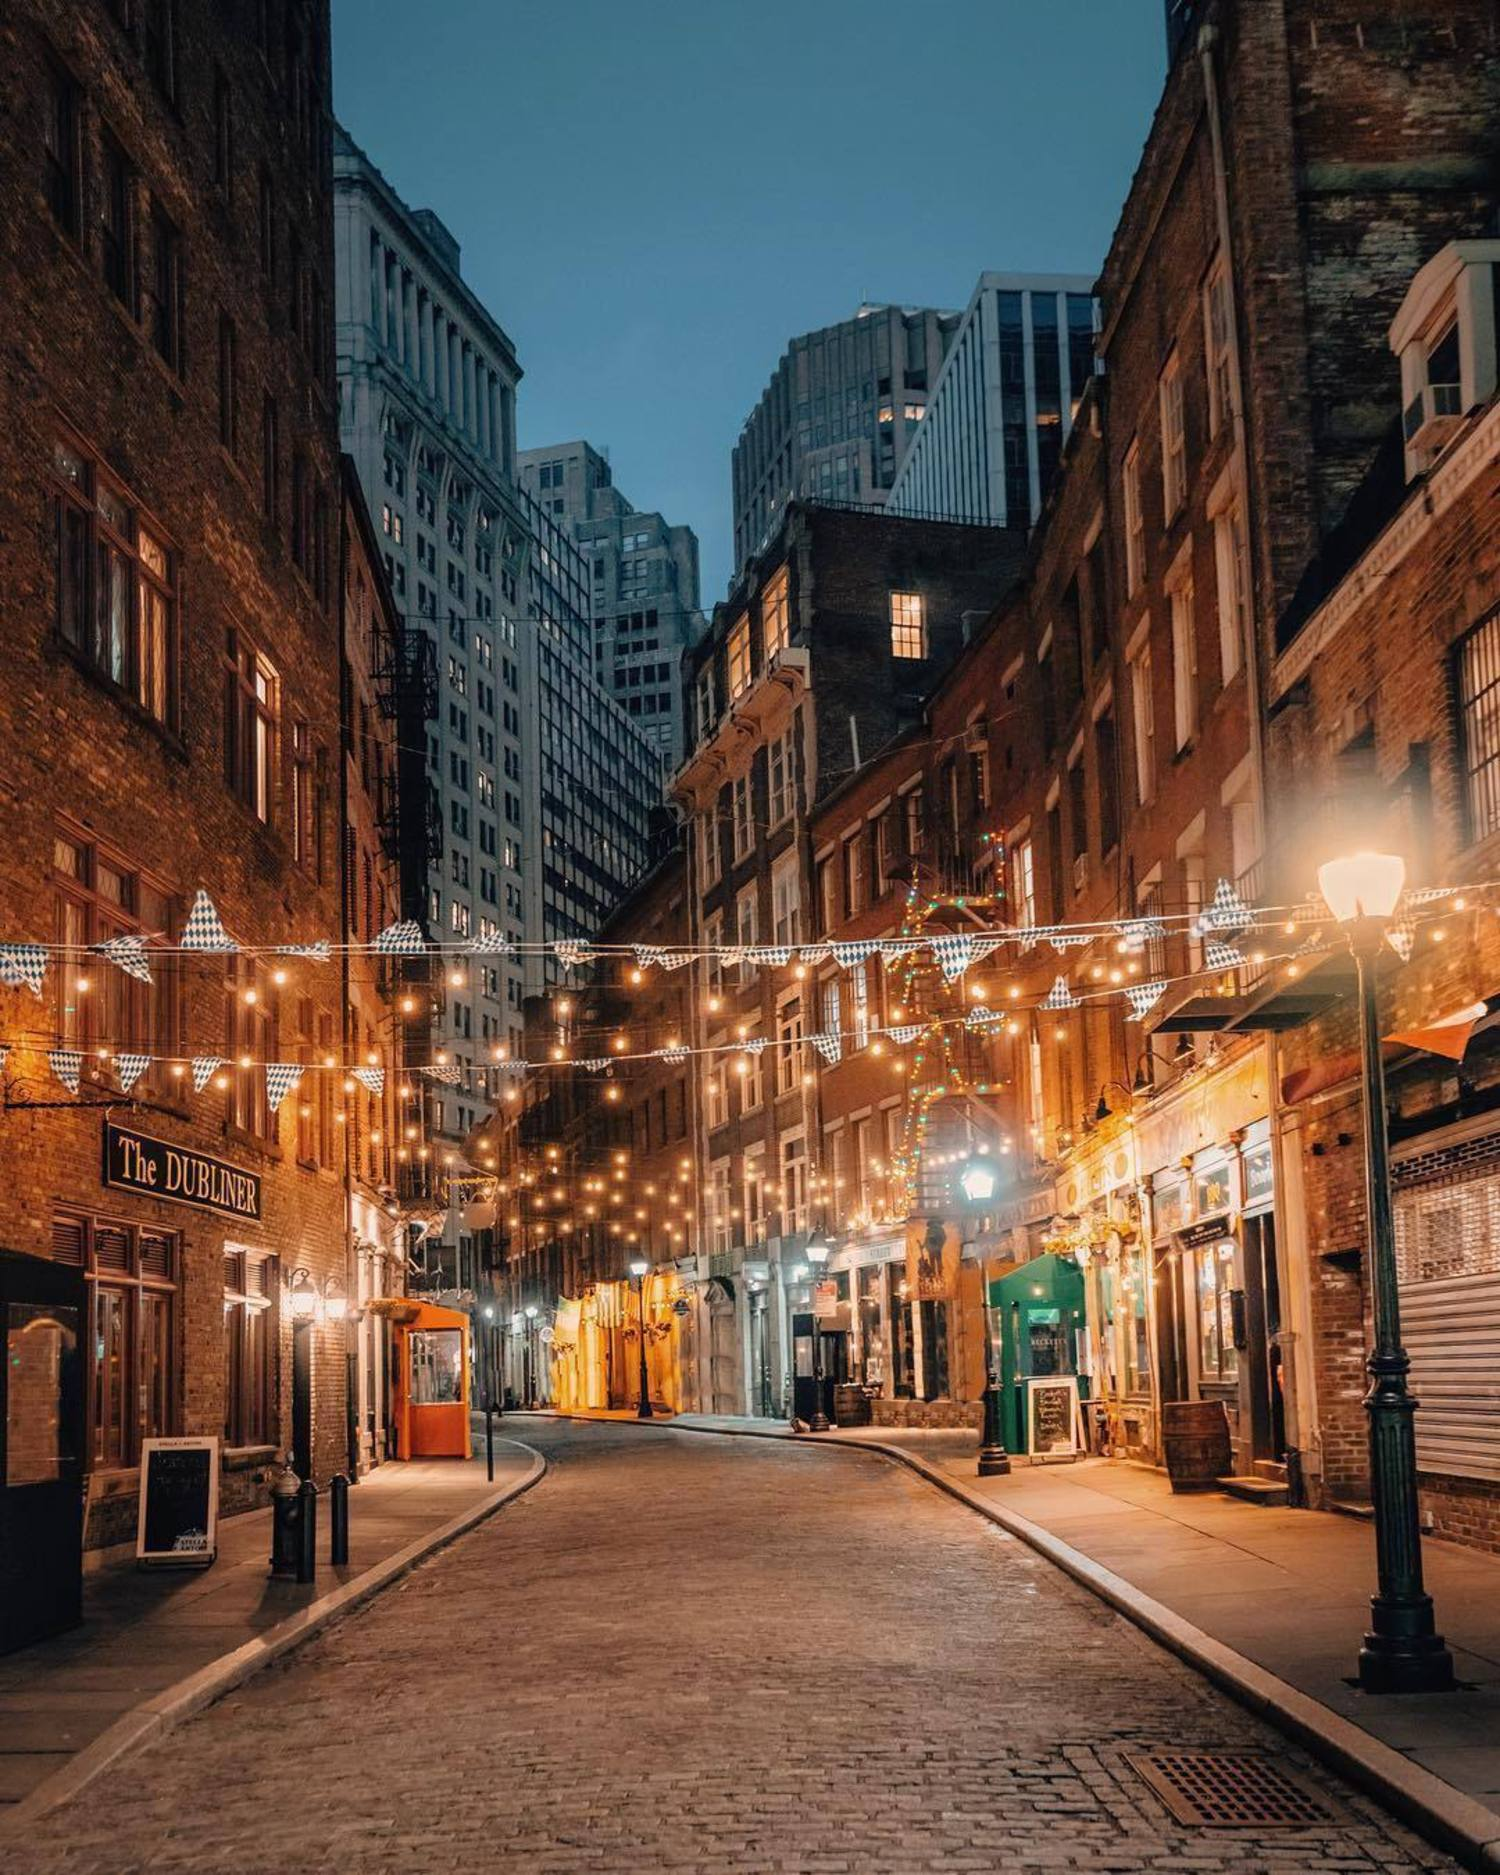 Stone Street, New York, New York. Photo via @joethommas #viewingnyc #nyc #newyork #newyorkcity